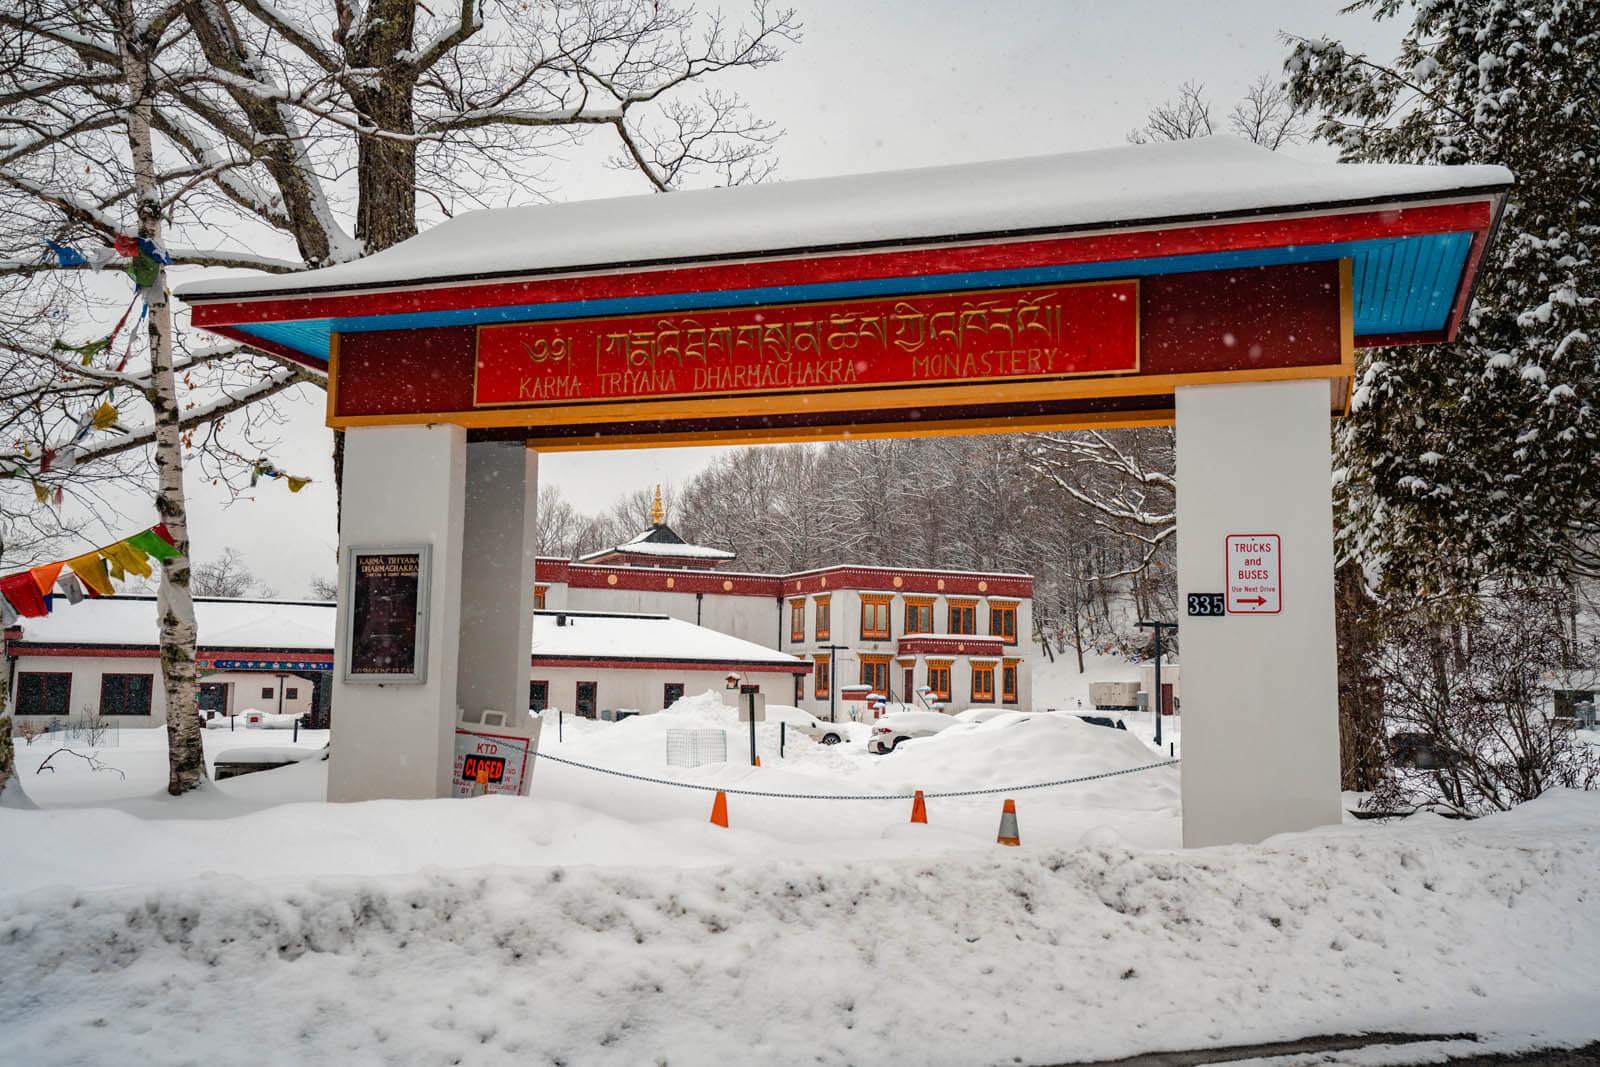 Karma Triyana Dharmachakra Monastery in Woodstock New York in the Catskills